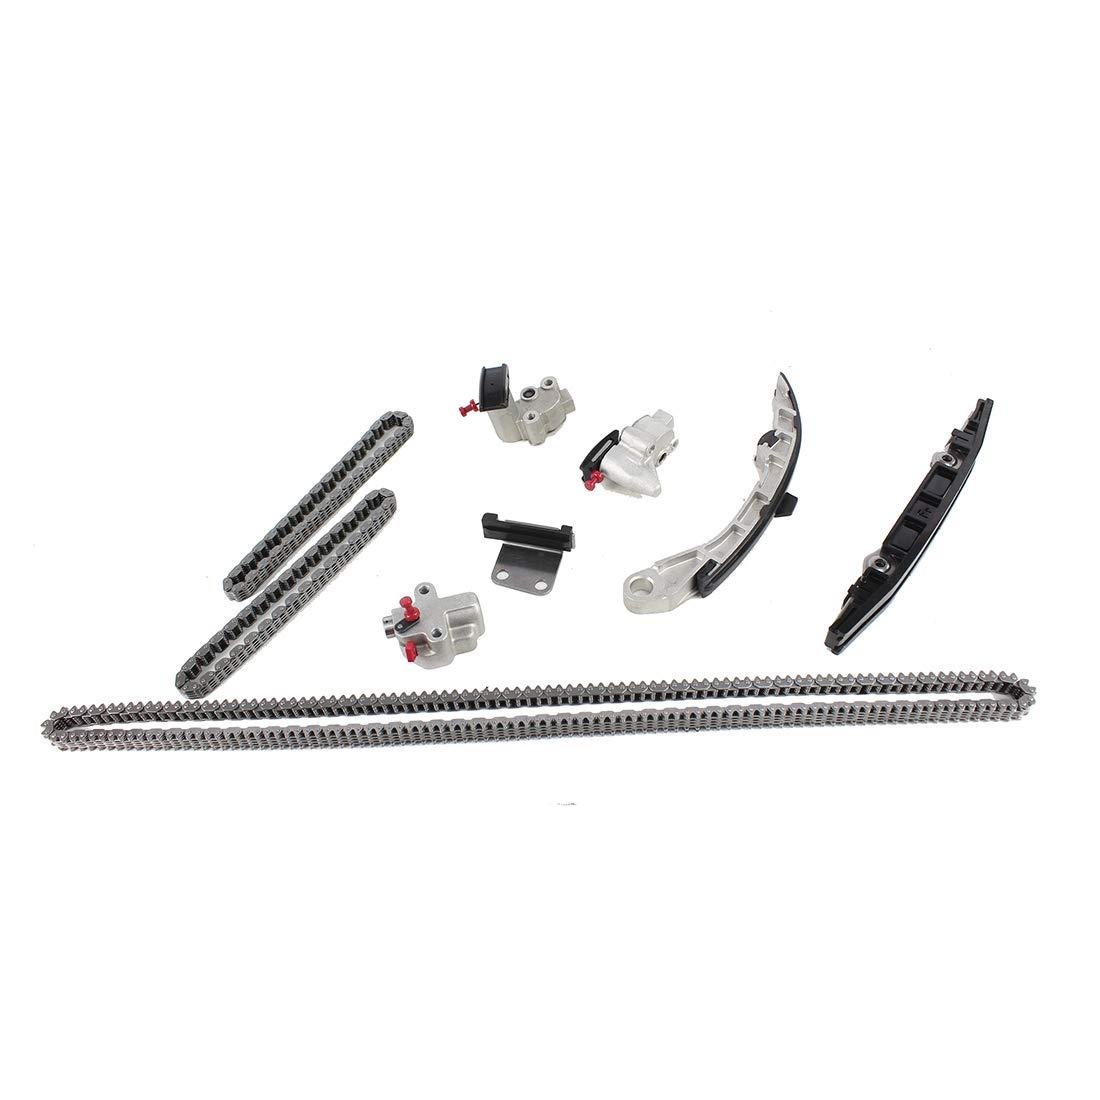 QX60 // 3.5L // DOHC // V6 // 24V // 3498cc // VQ35DE JX35 Nissan//Altima Quest DNJ TK656NG Timing Chain Kit for 2007-2015 // Infiniti Pathfinder Maxima Murano